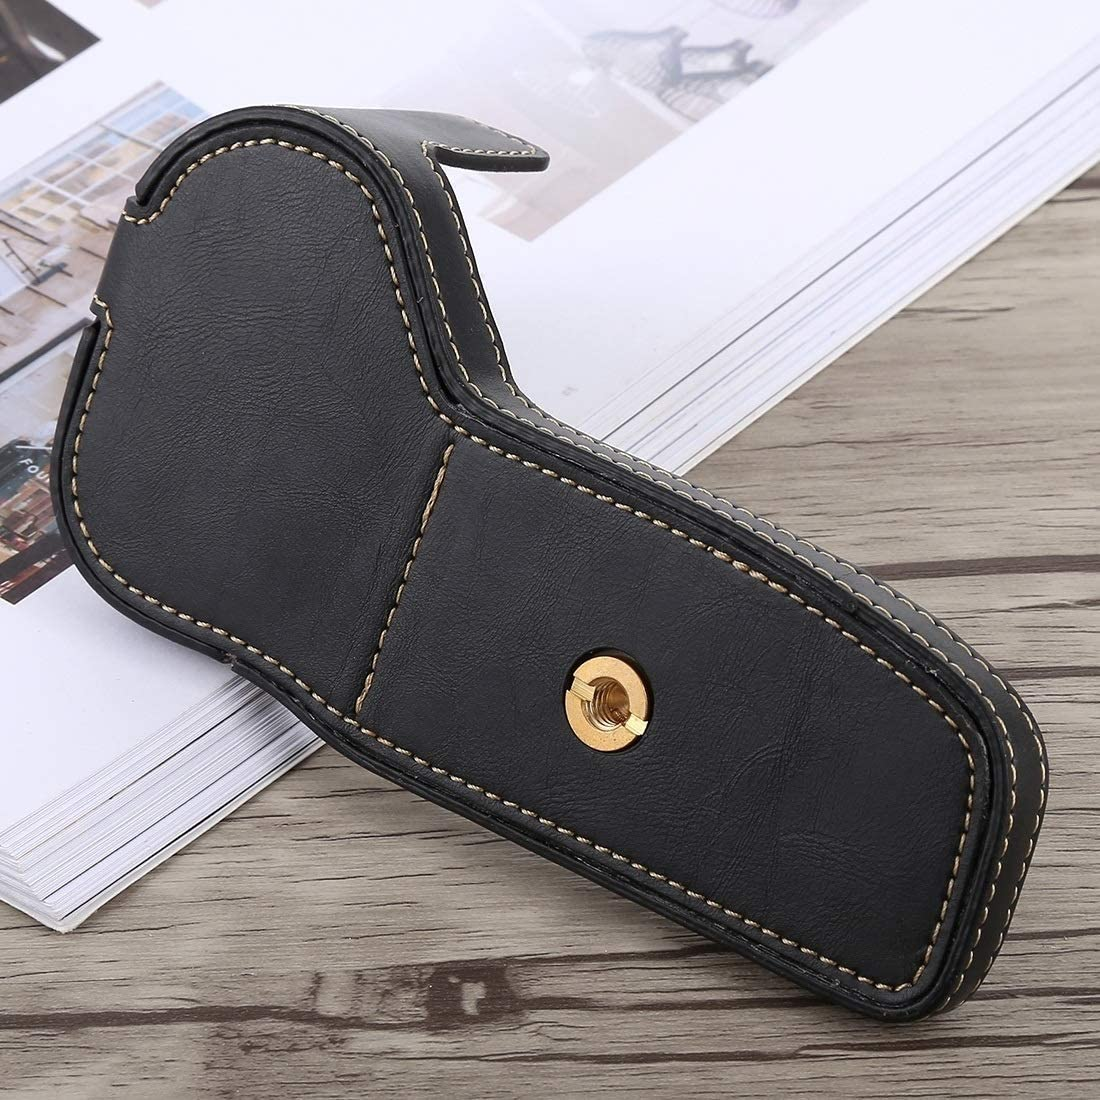 Black SHUFEIVICC 1//4 inch Thread PU Leather Camera Half Case Base for Canon EOS 6D 6D Mark II Color : Black